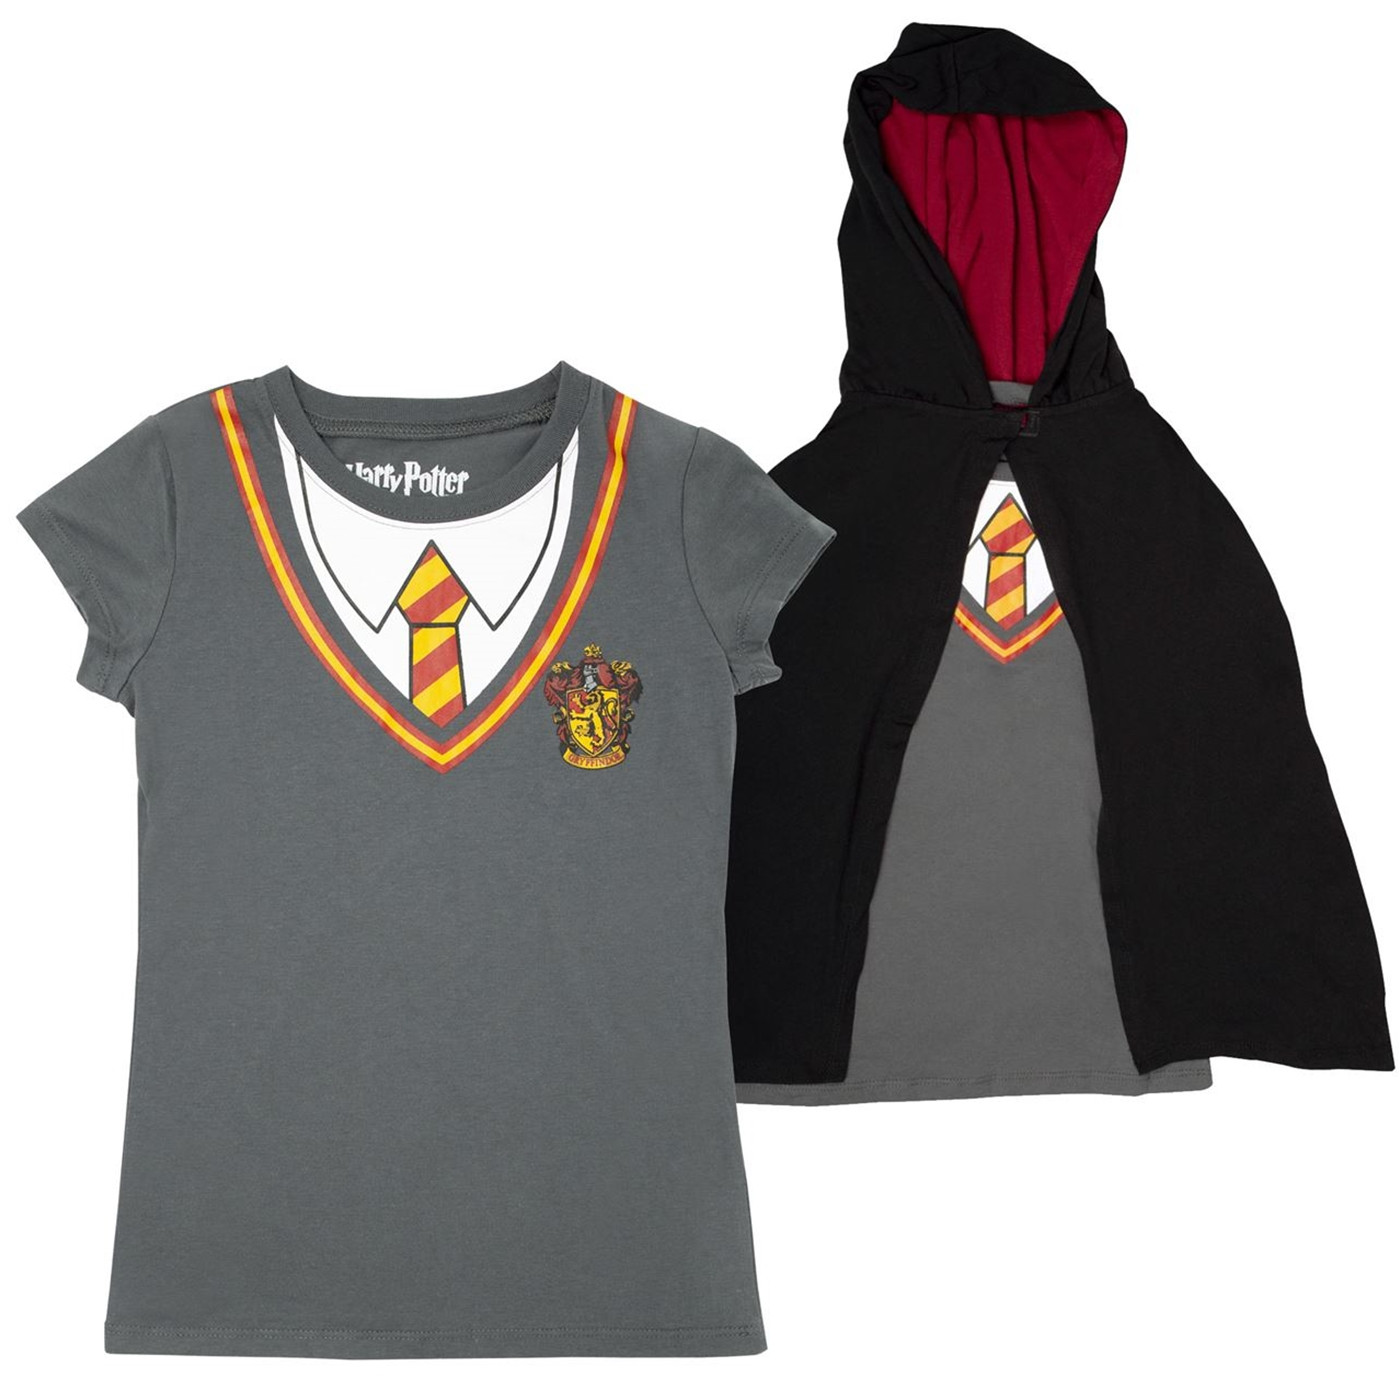 Harry Potter Costume T-Shirt